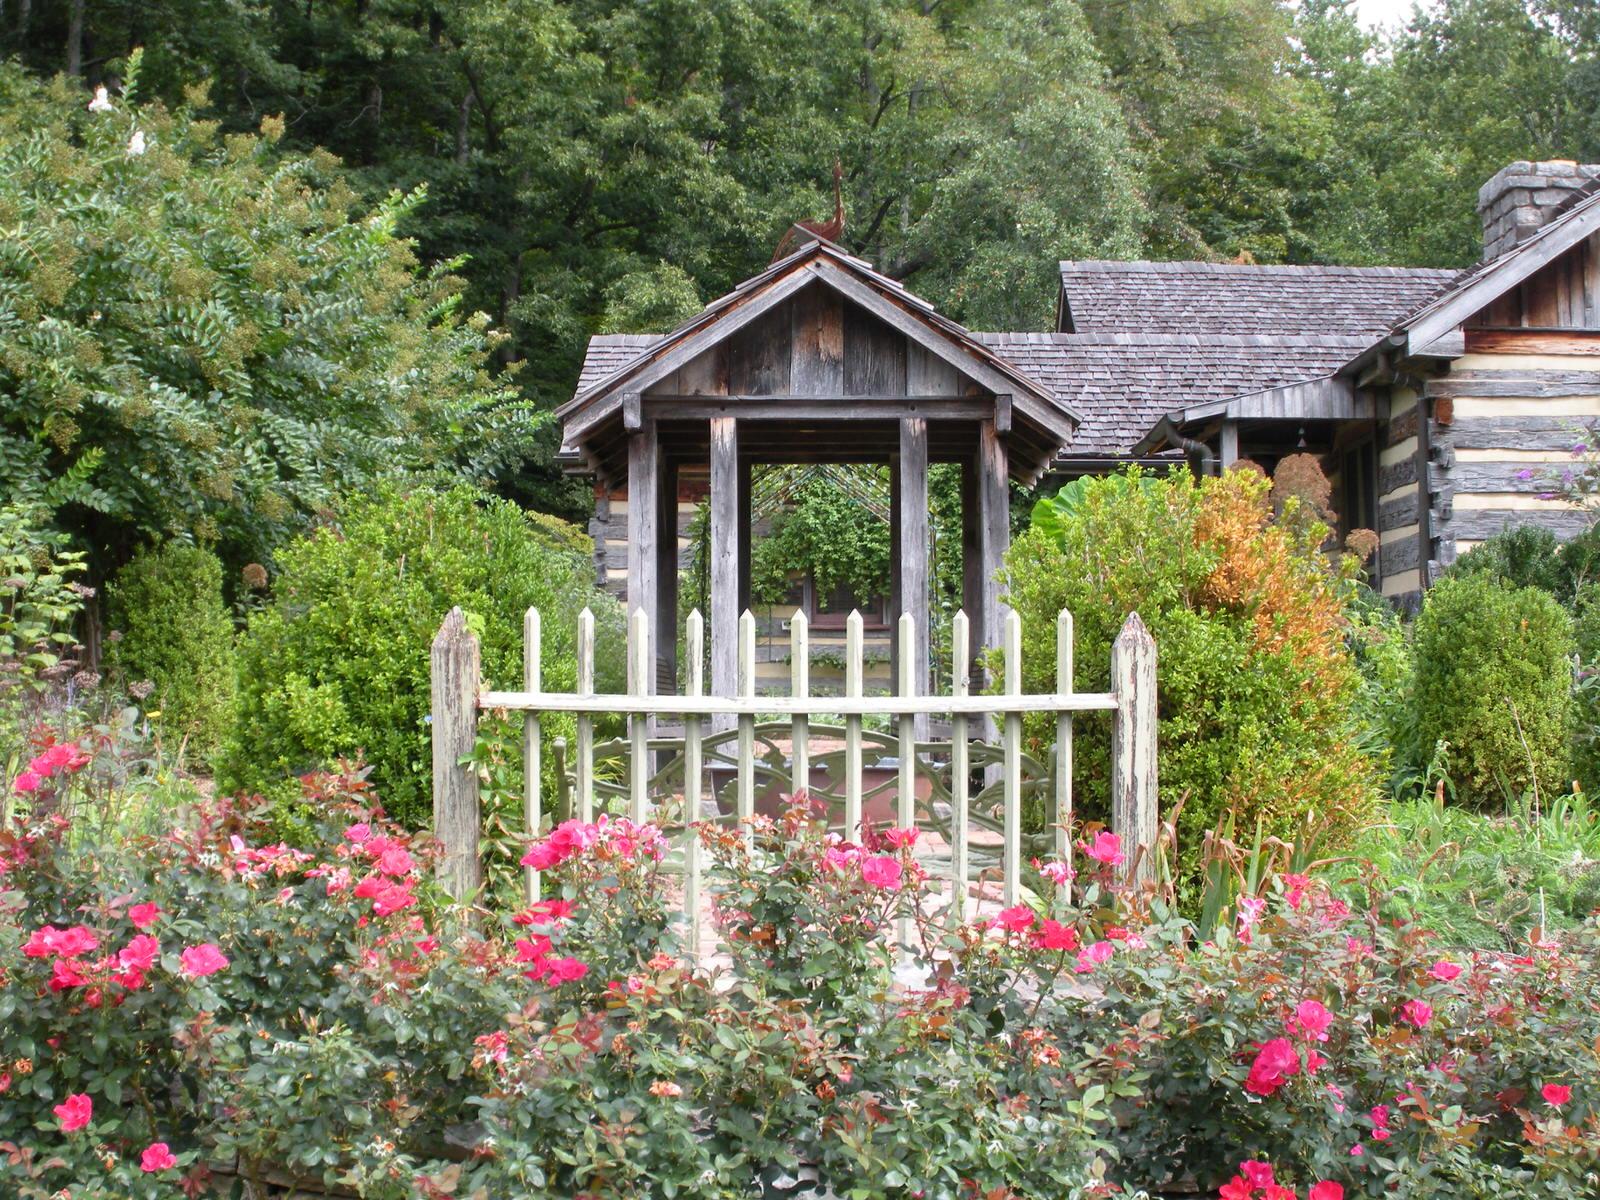 Justin Stelter Landscape Gardening - Country Garden - Justin Stelter Landscape Gardening - Country Garden2887103378_7fb253f0e7_o.jpg